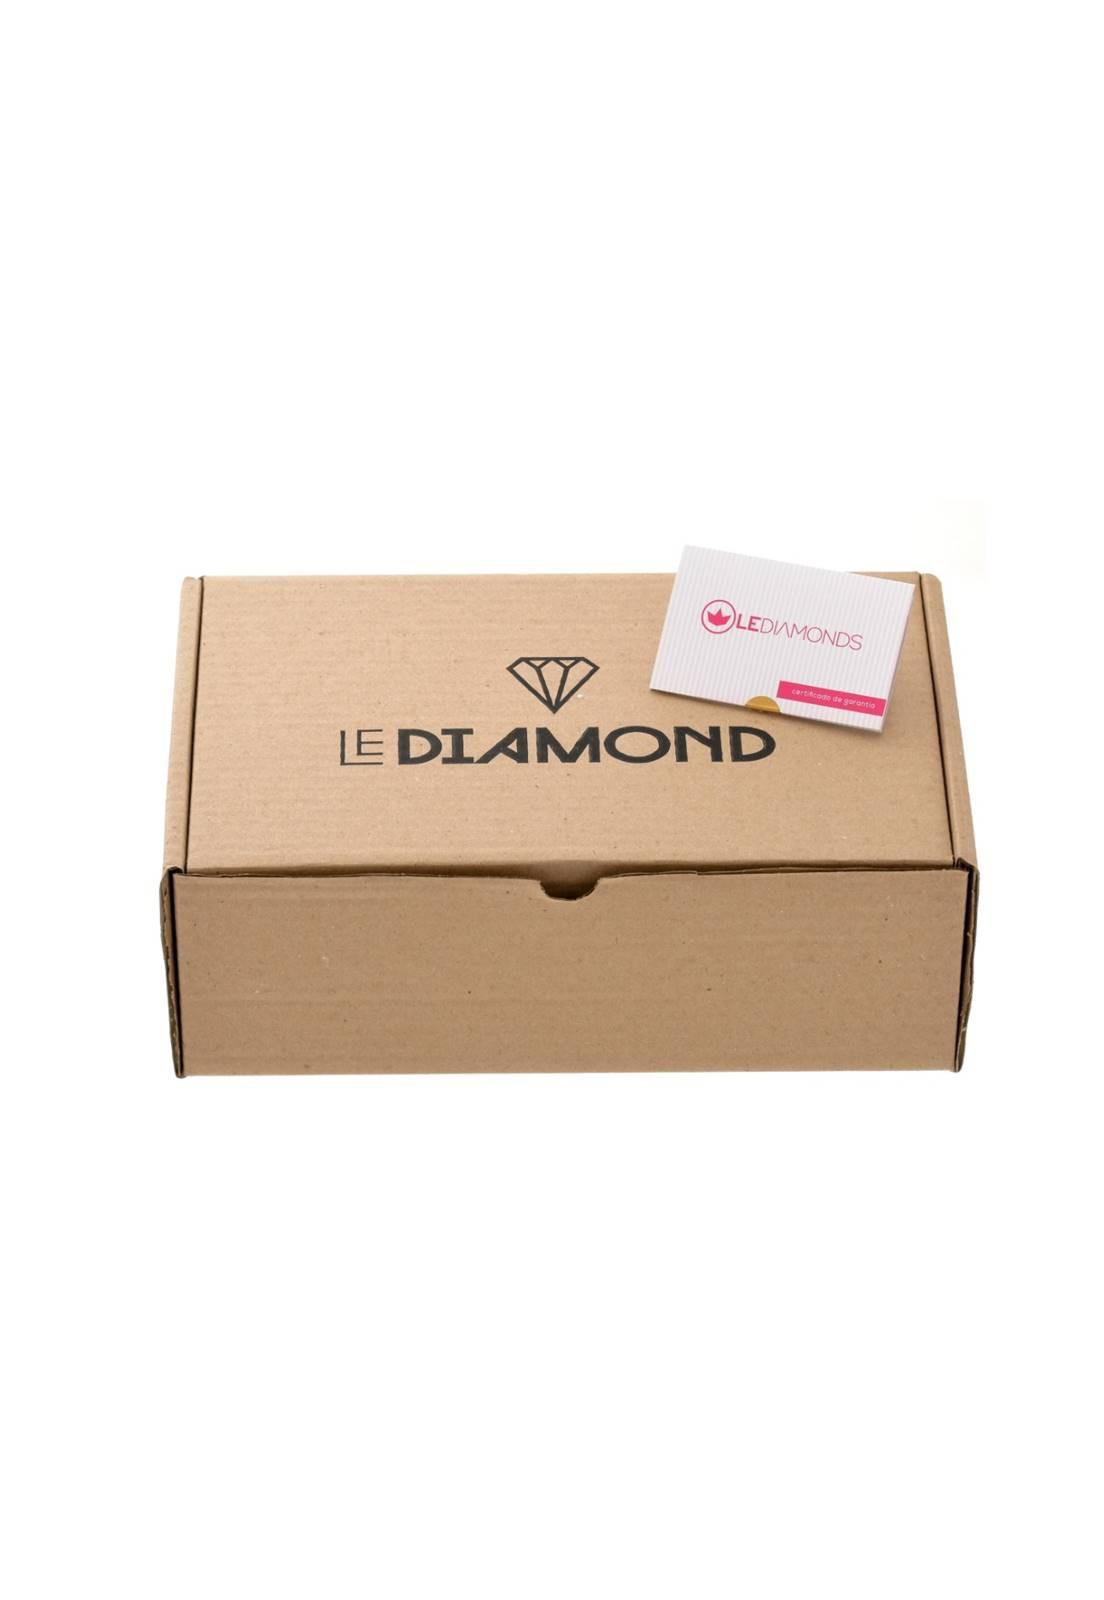 Brinco Le Diamond Argola Vista de Arles Branco e Turquesa